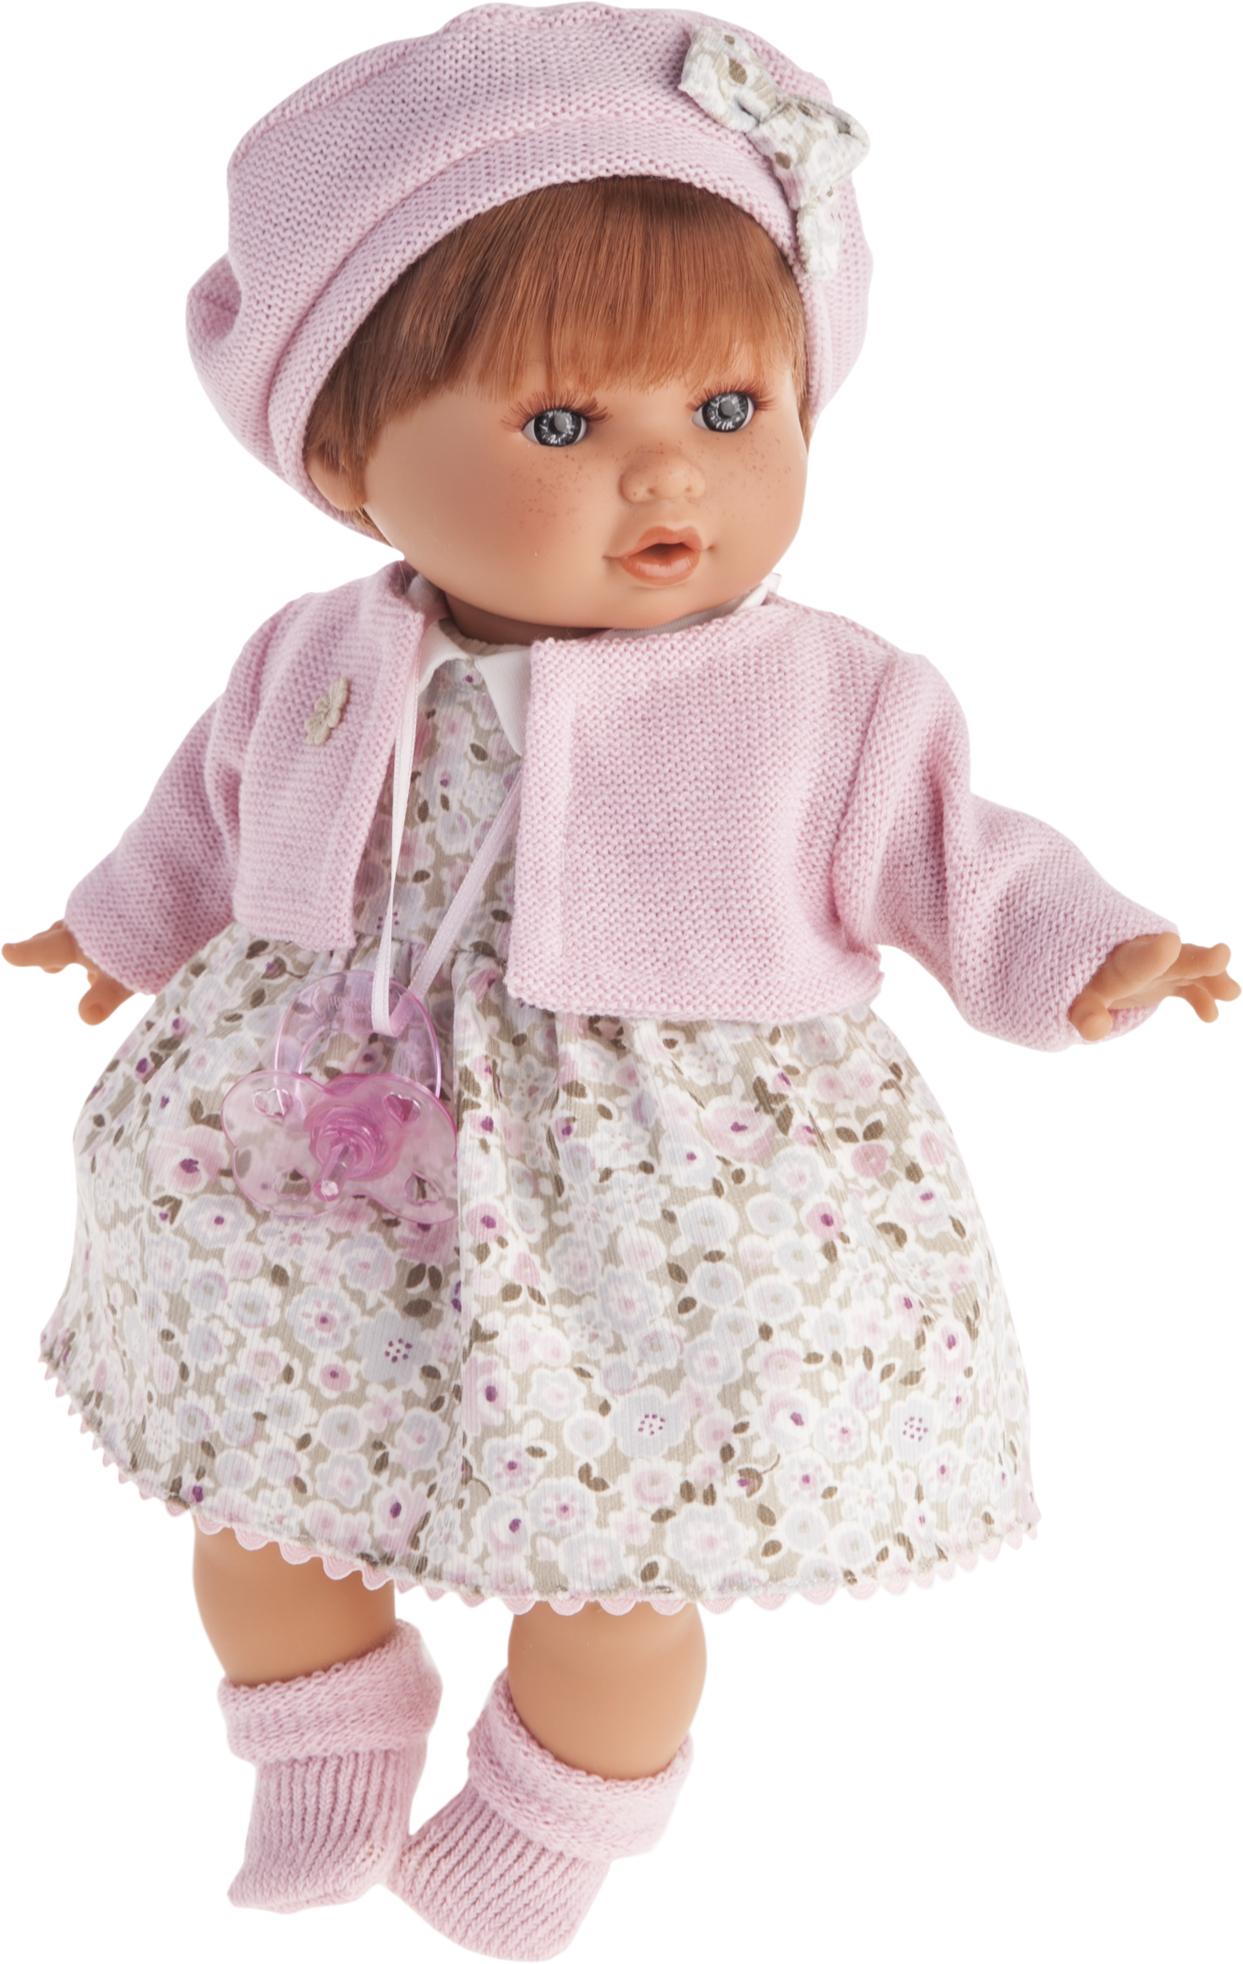 Кукла Кристиана в розовом, плачет, 30 см.Куклы Антонио Хуан (Antonio Juan Munecas)<br>Кукла Кристиана в розовом, плачет, 30 см.<br>